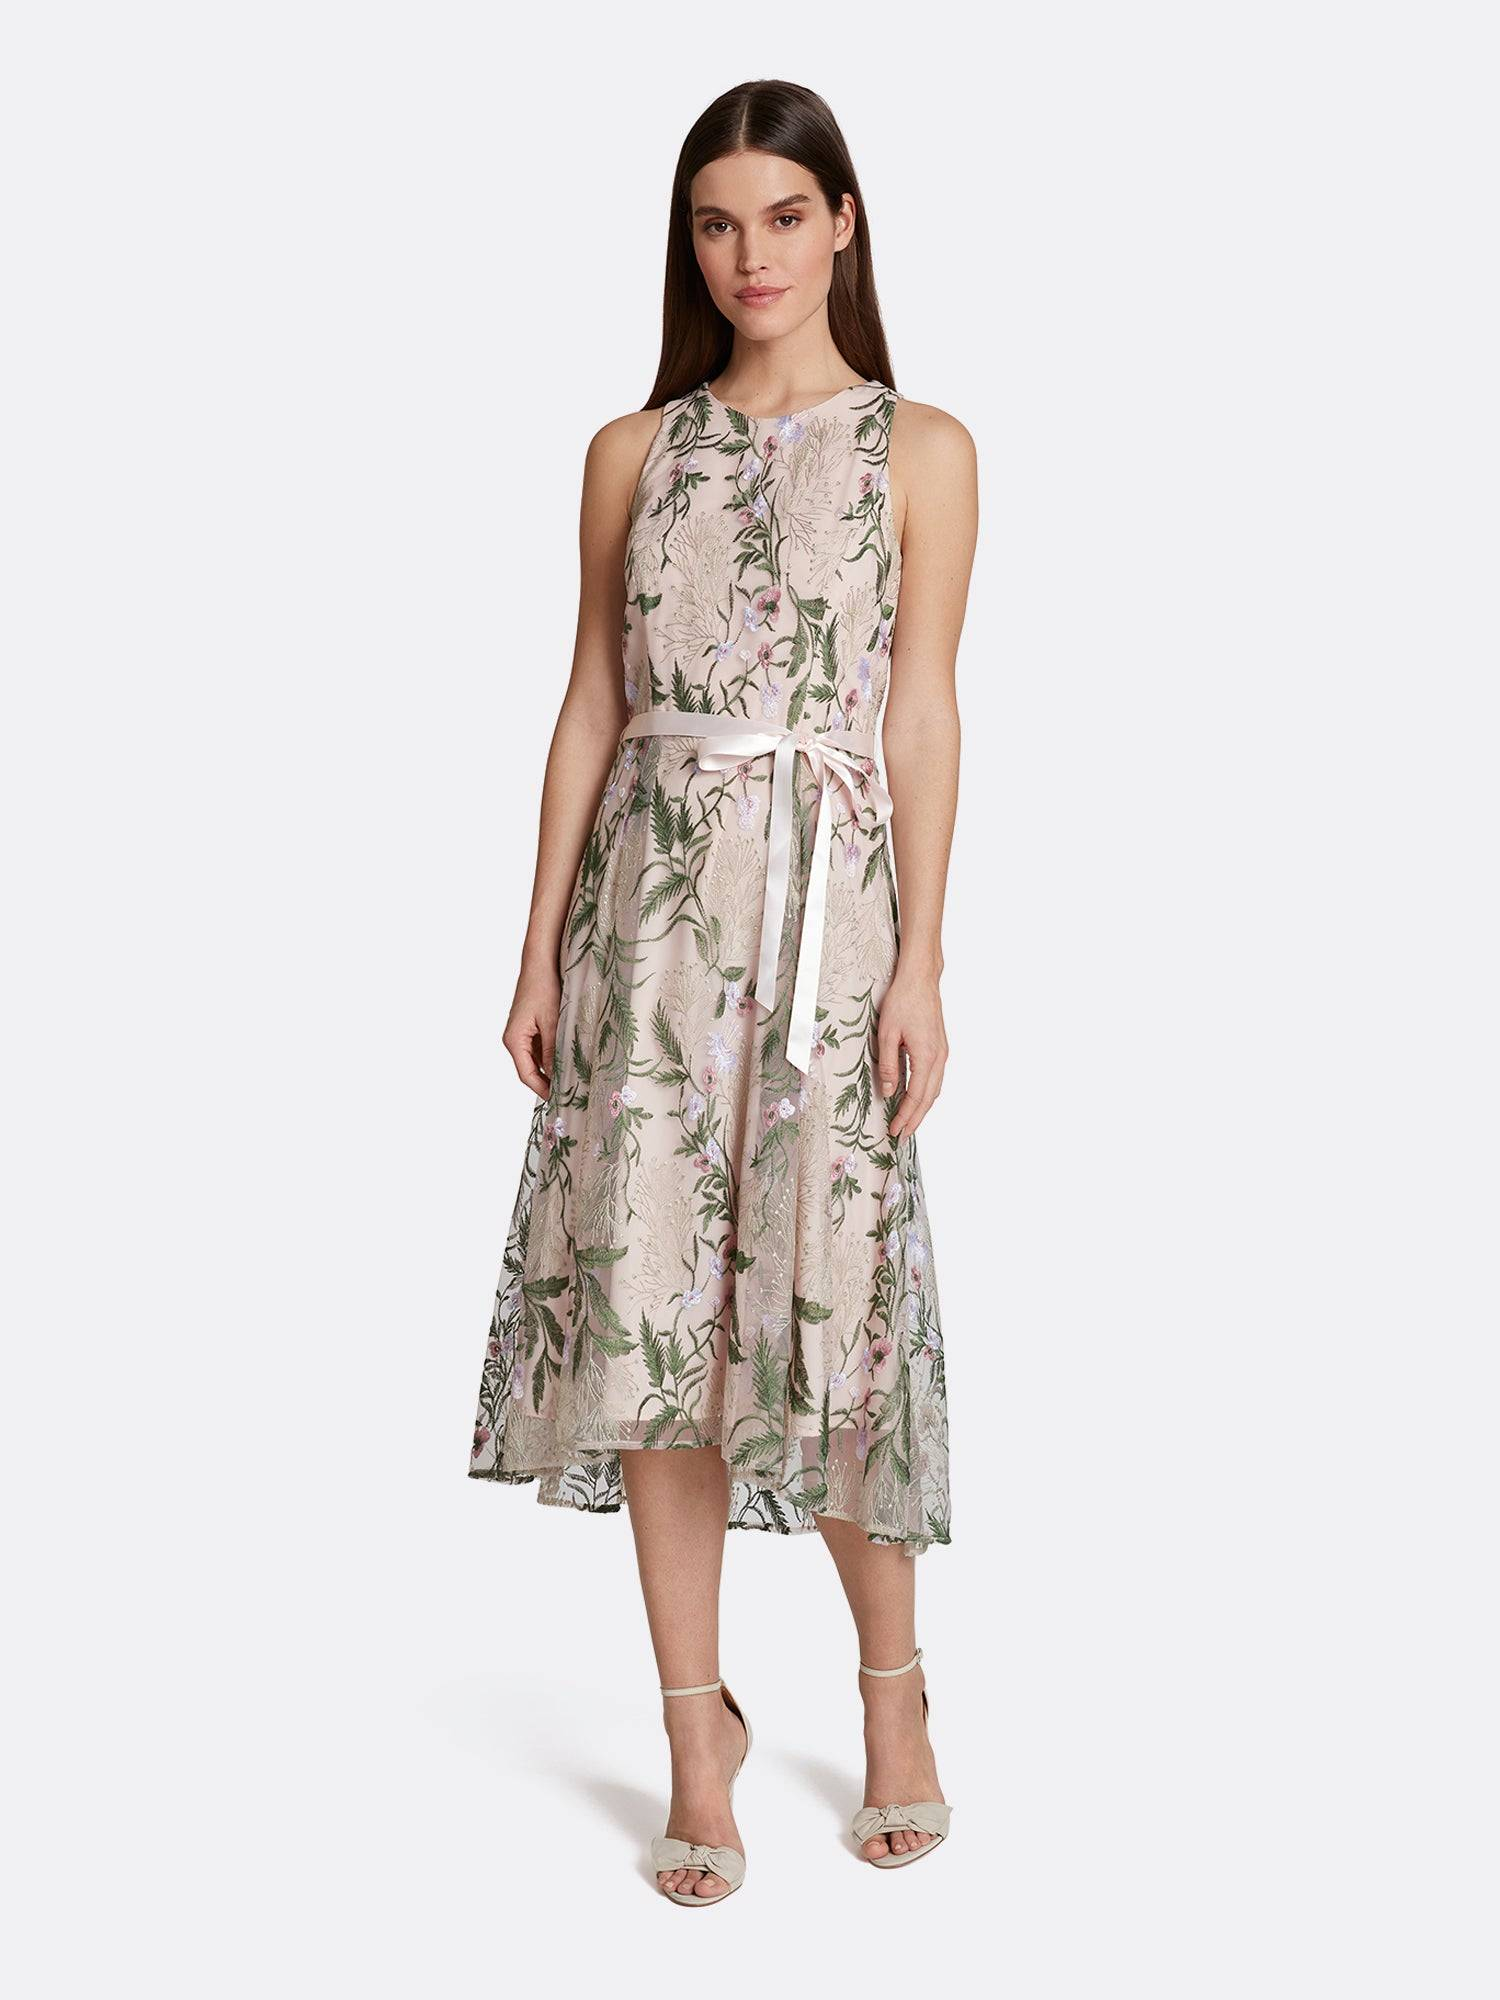 Tahari ASL Floral Embroidered Hi-Low Petite Dress Blush Multi Embroidery 12P